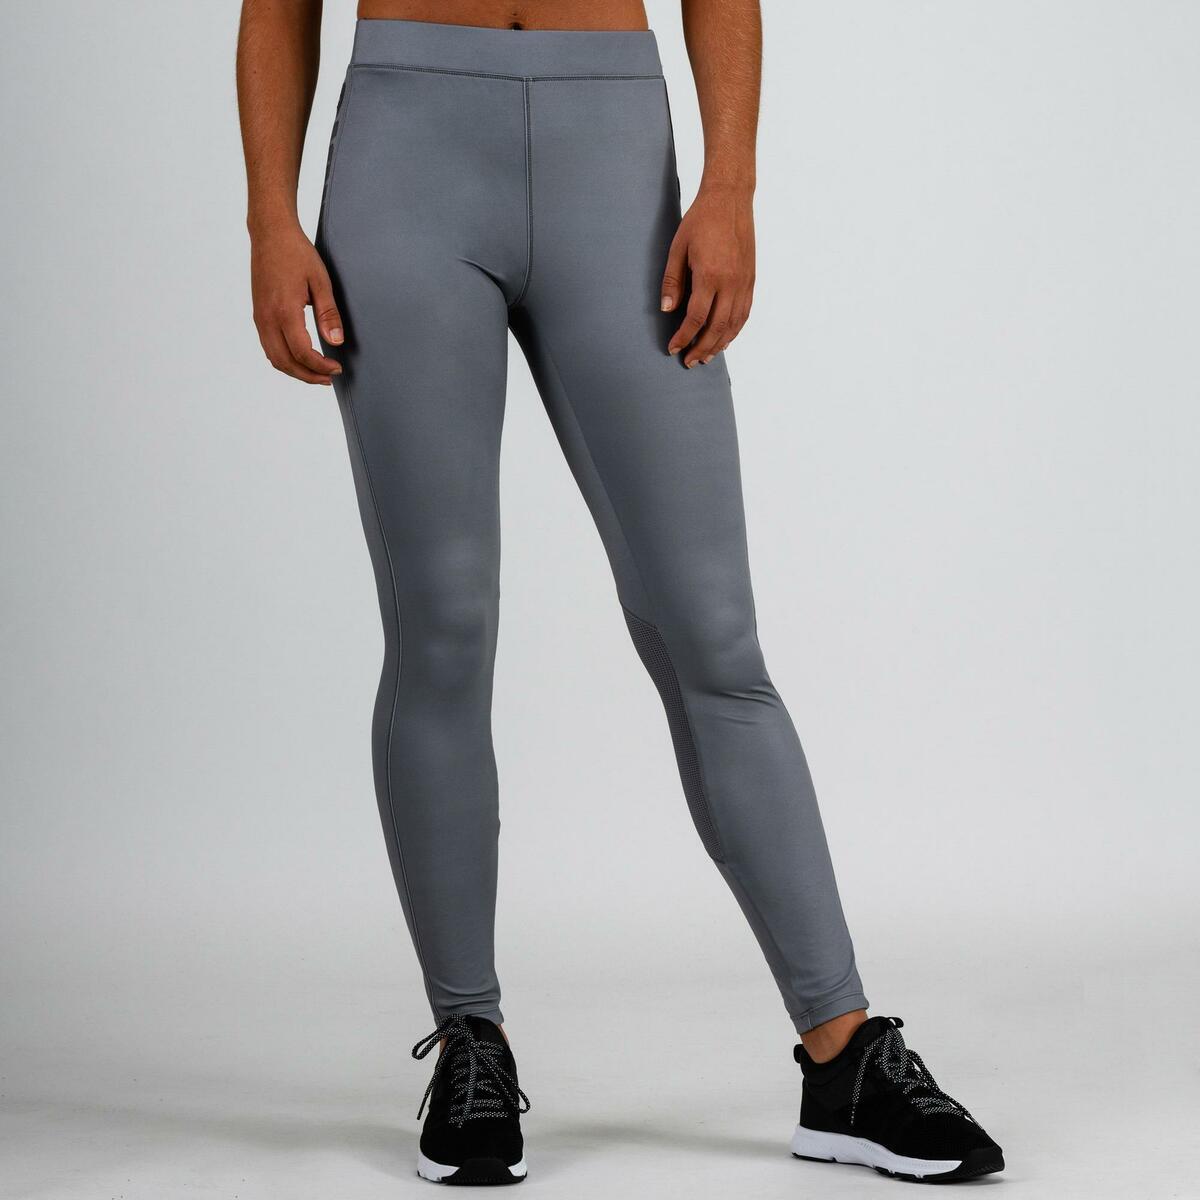 Bild 1 von Leggings FTI 120 Fitness Cardio Damen grau